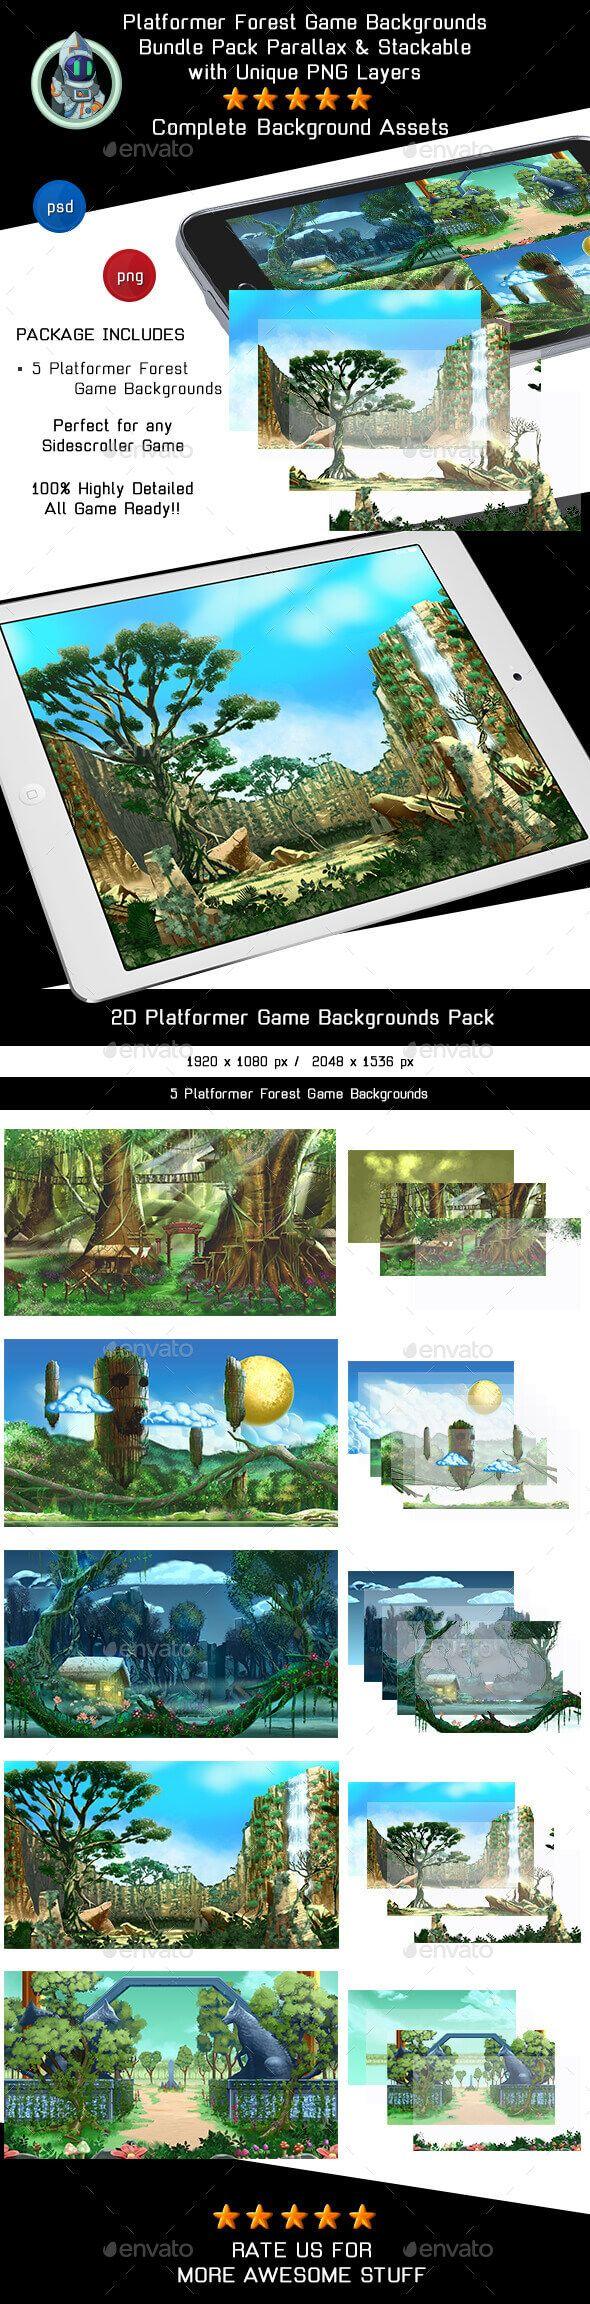 5 Platformer Forest Game Backgrounds - Parallax & Stackable - Backgrounds Game Assets